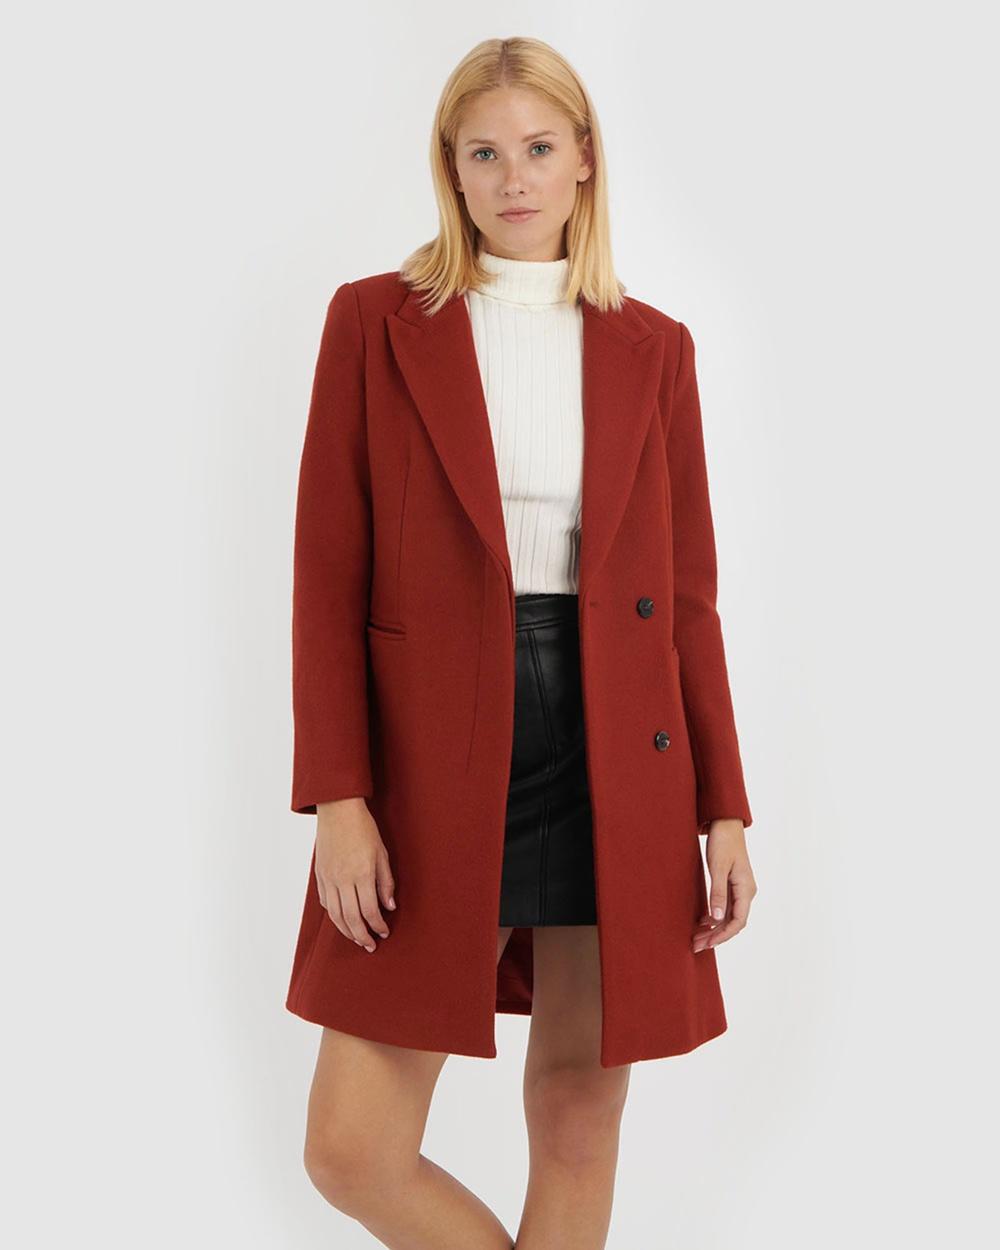 Forcast Kaelynn Wool Blend Coat Coats & Jackets Crimson Red Wool-Blend